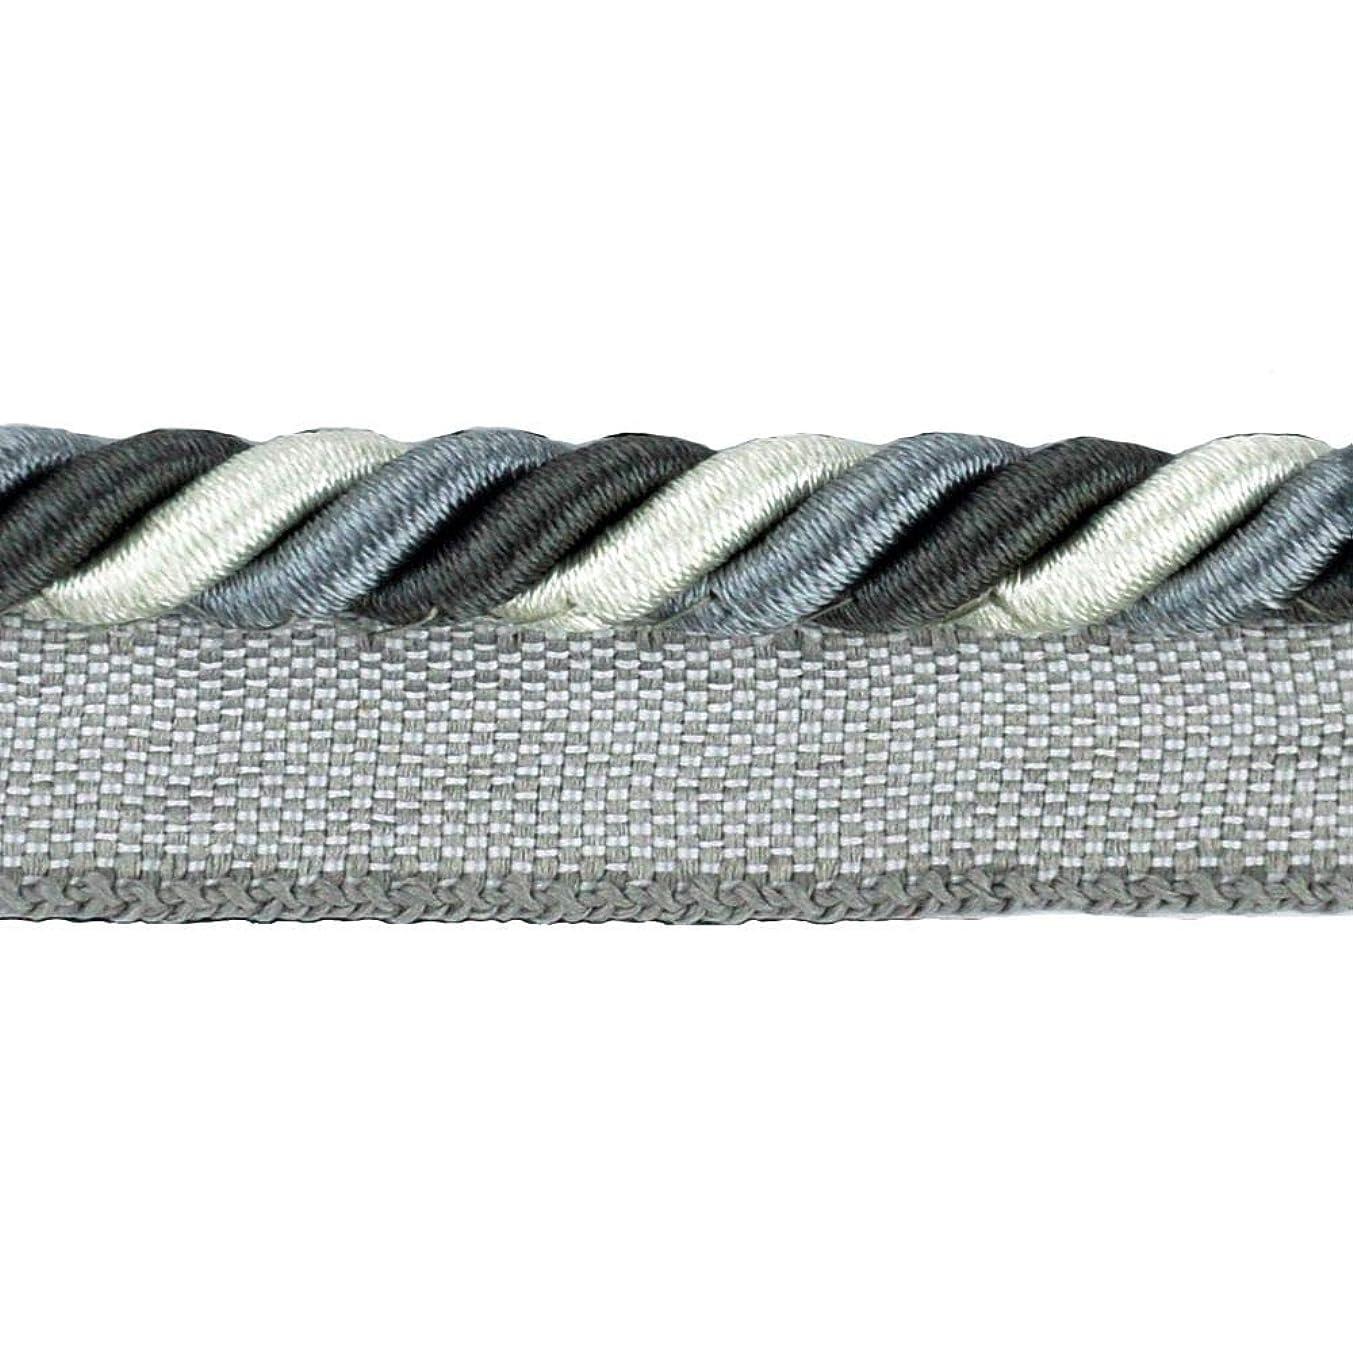 BELAGIO Enterprises BC-1023-49-11 Cord with Lip Gunmetal